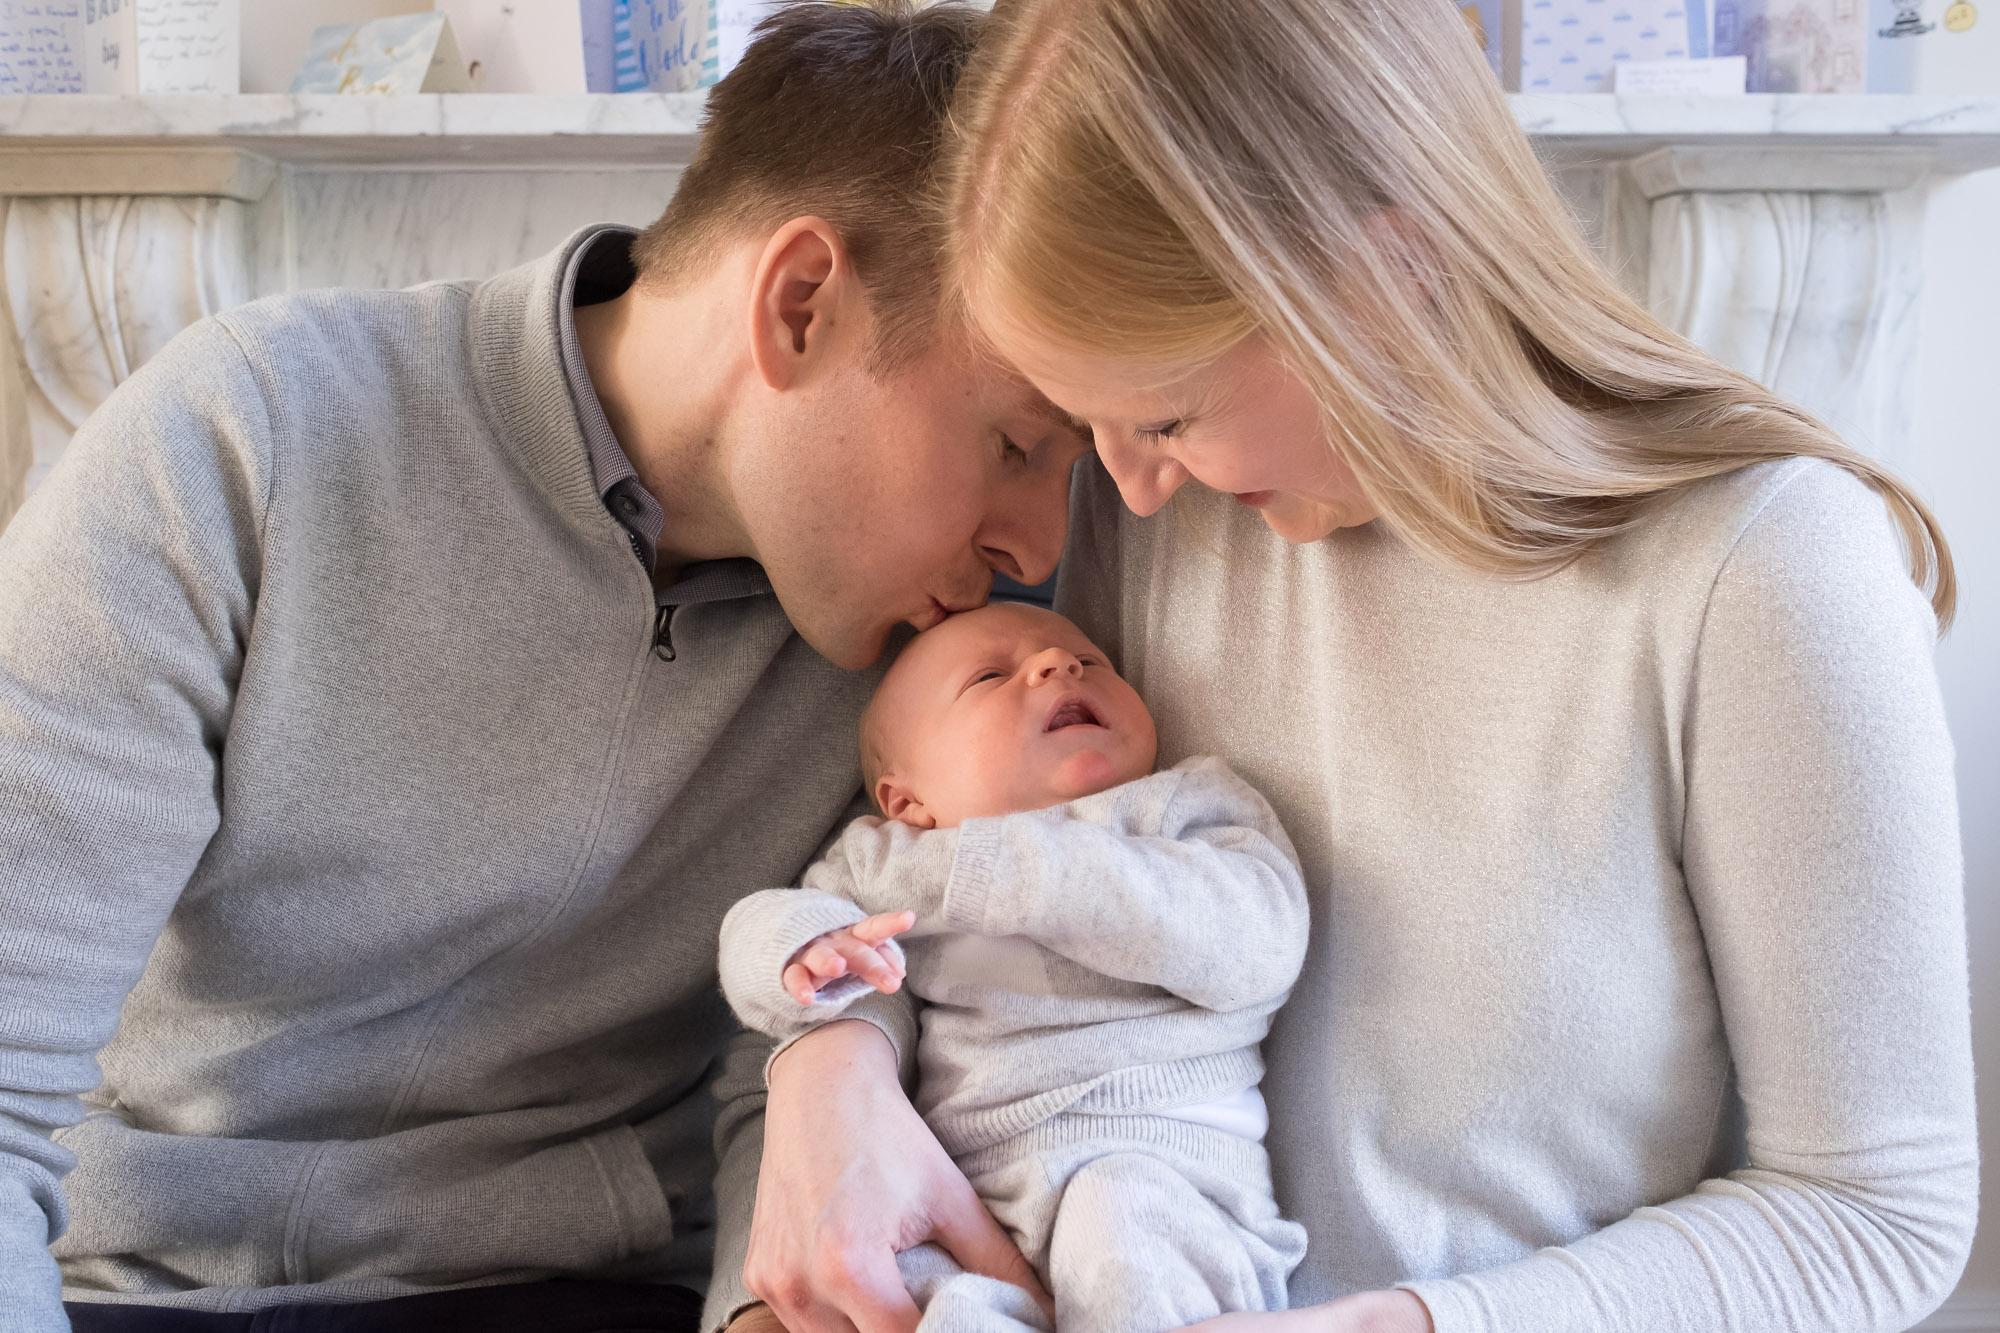 family-portrait-baby-photographer-119.jpg